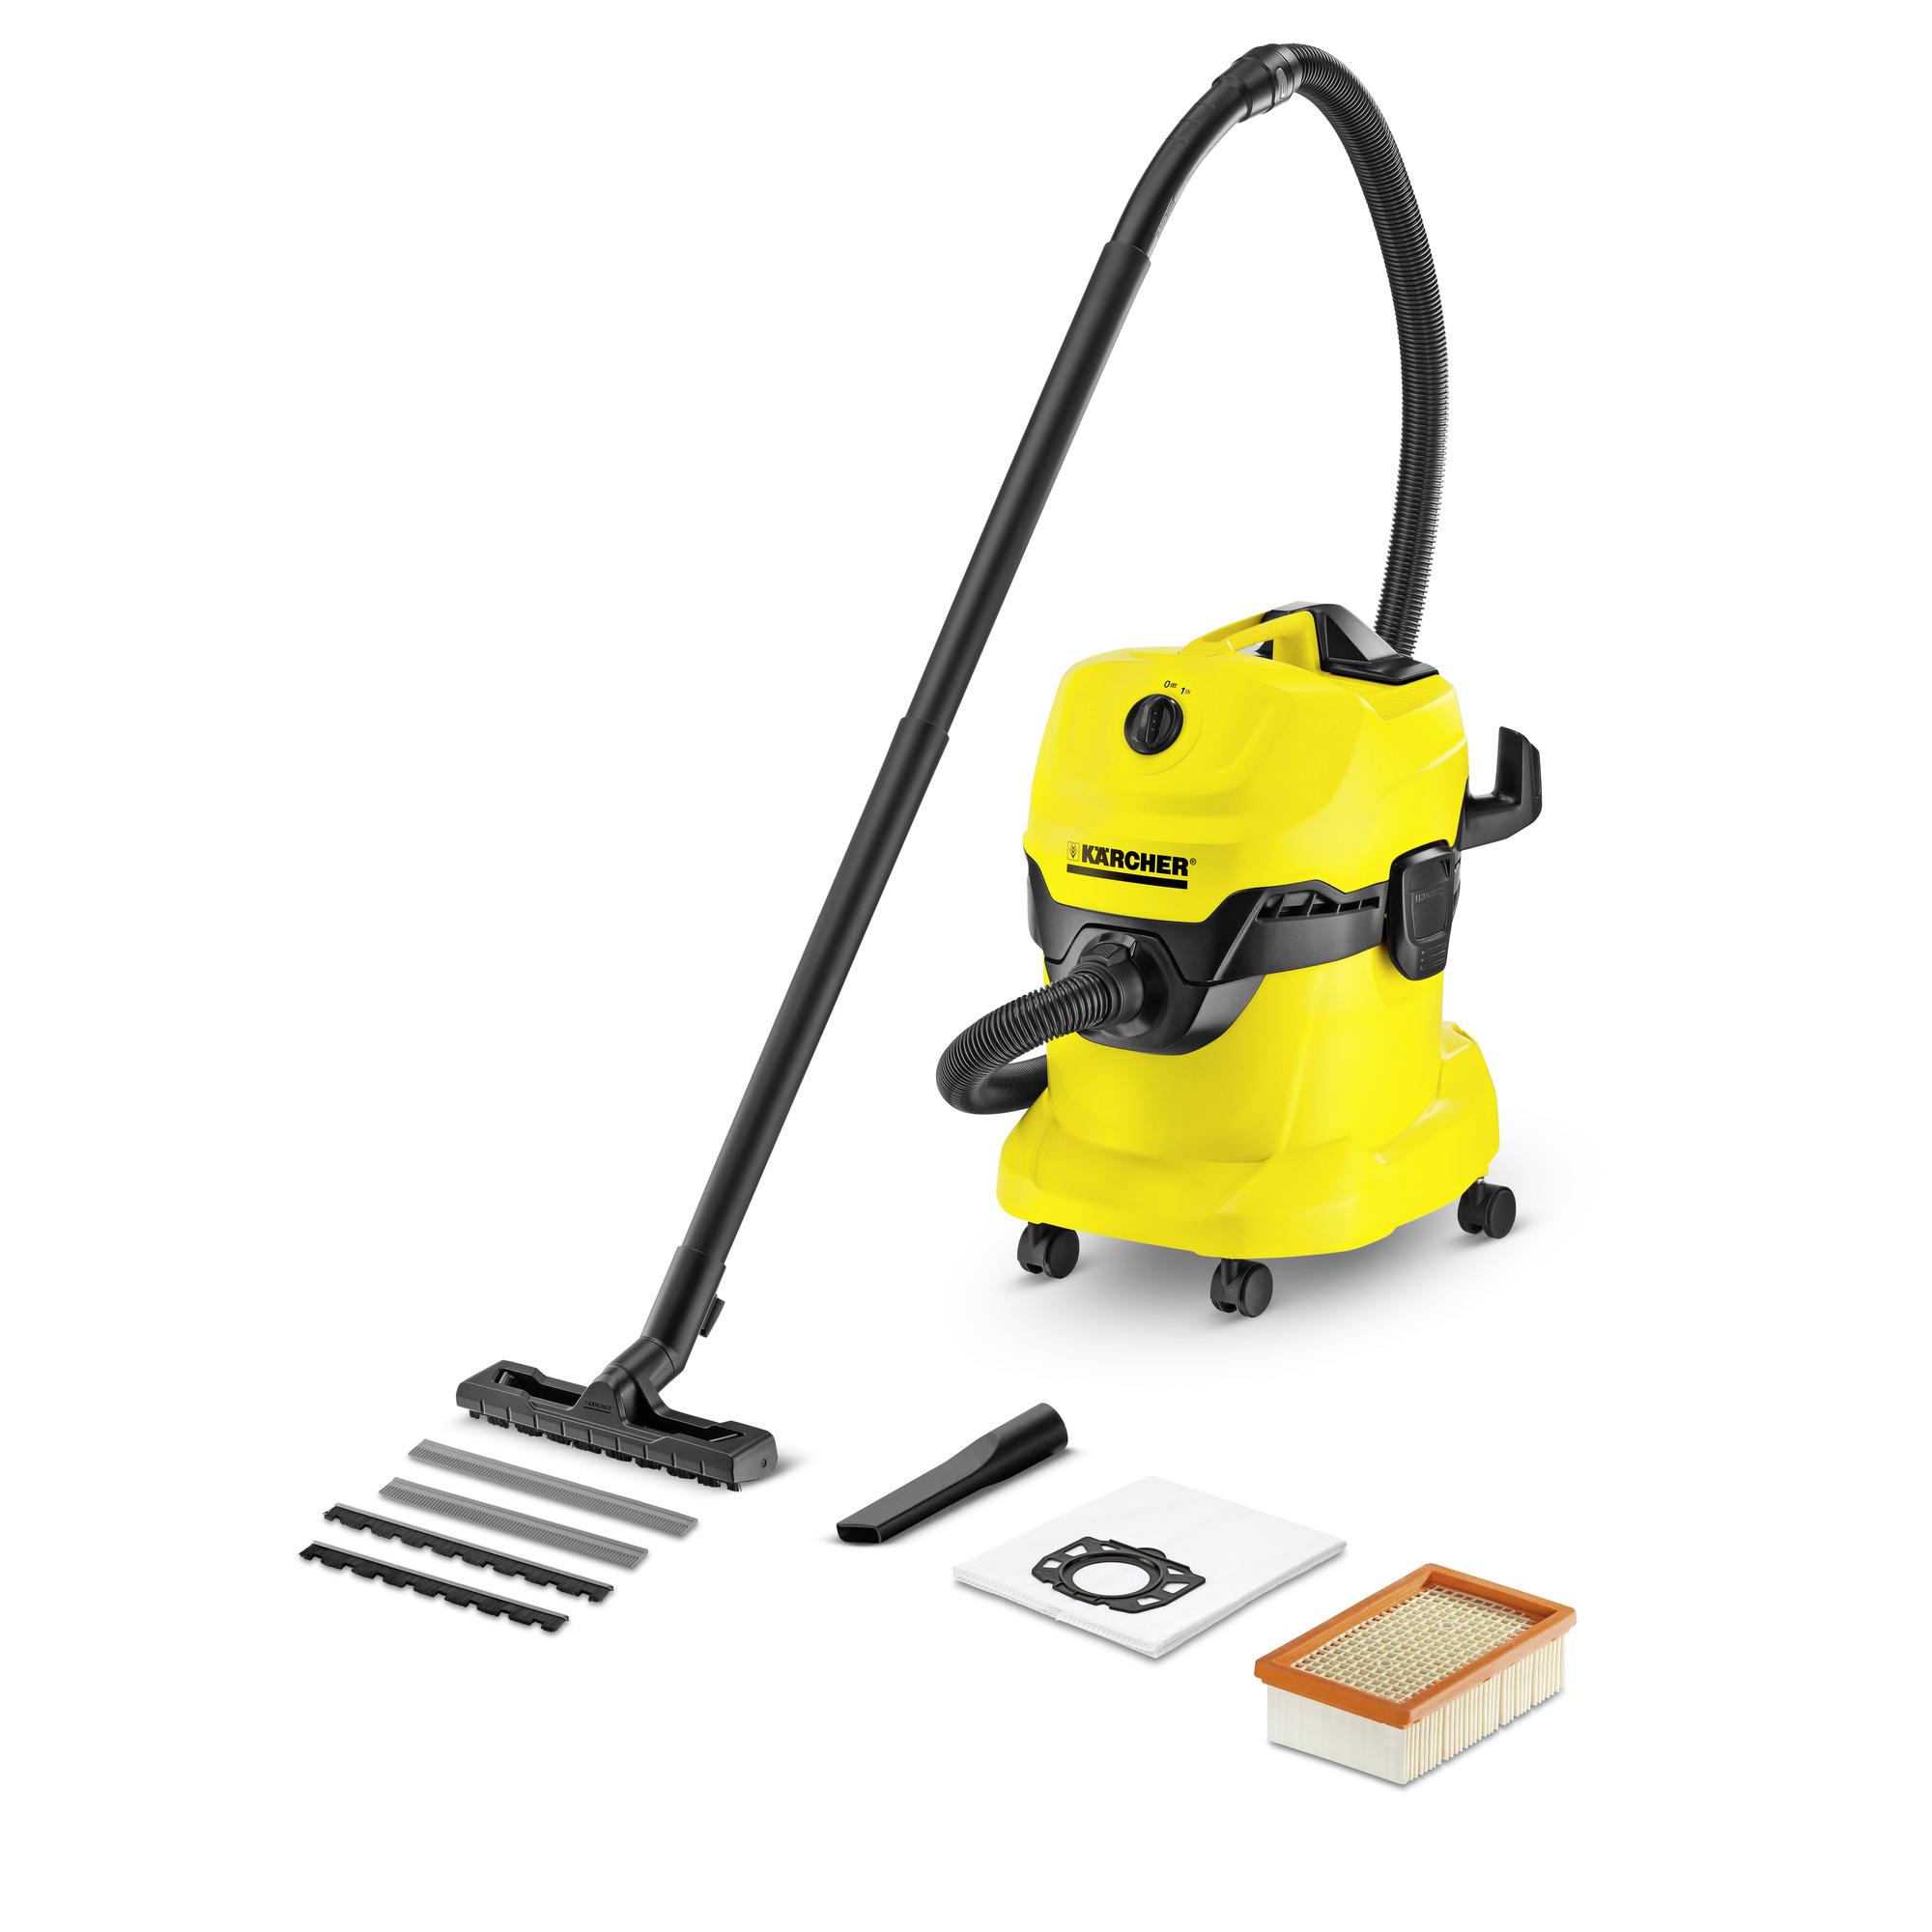 Karcher-usisivač-Karcher-multifunkcionalni-usisivač-Usisivač-za-suvo-mokro-usisivanje-Karcher-WD-4-Karcher-Akcija